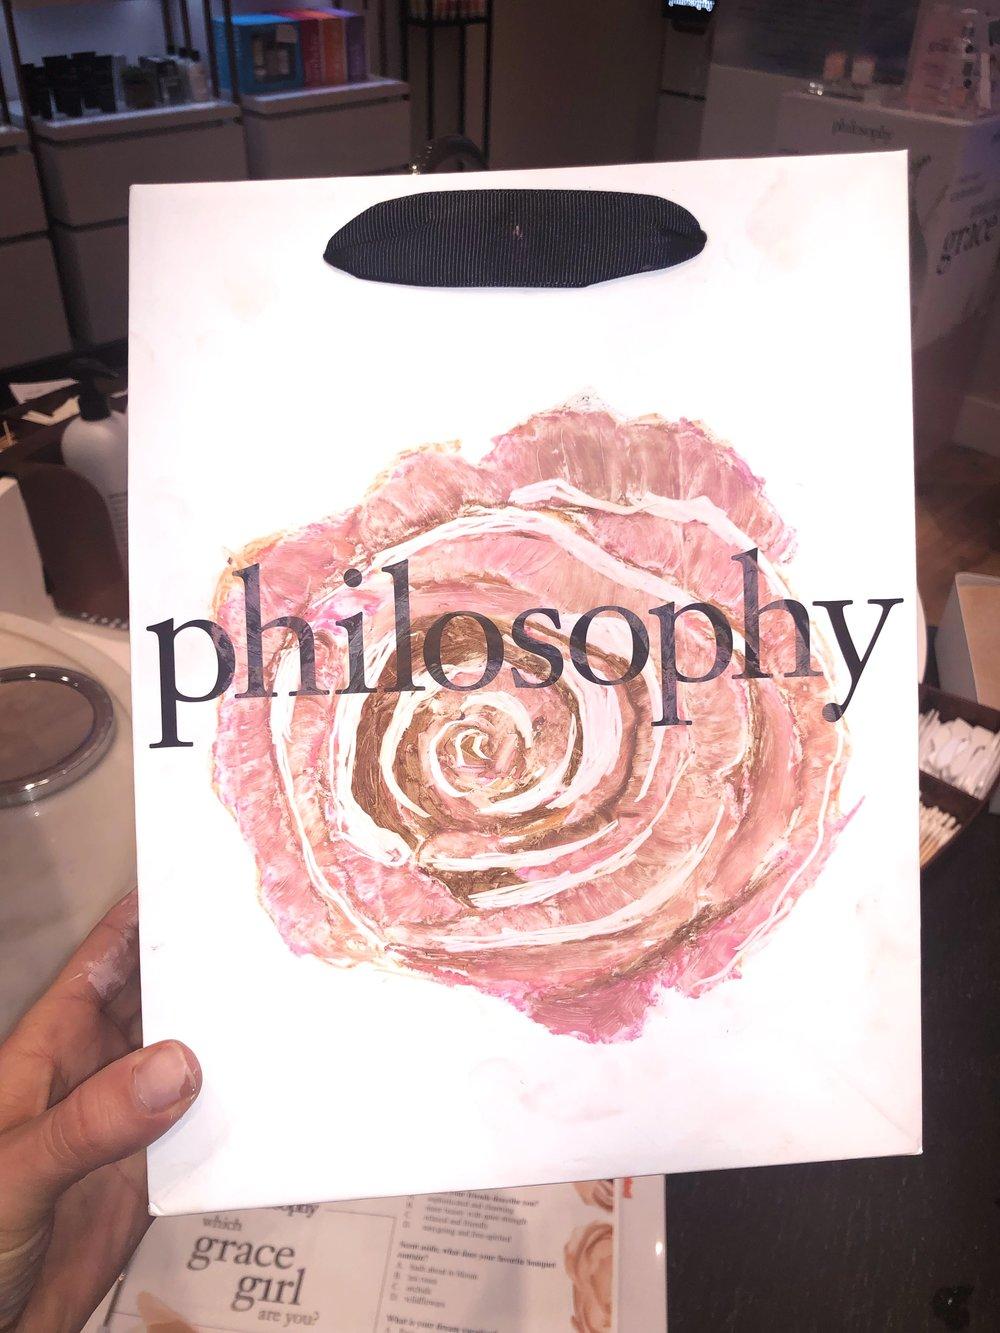 katrina-eugenia-philosophy-skincare-love-philosophy-amazing-grace-amazing-grace-ballet-rose-live-painting-oil-painting00.JPG